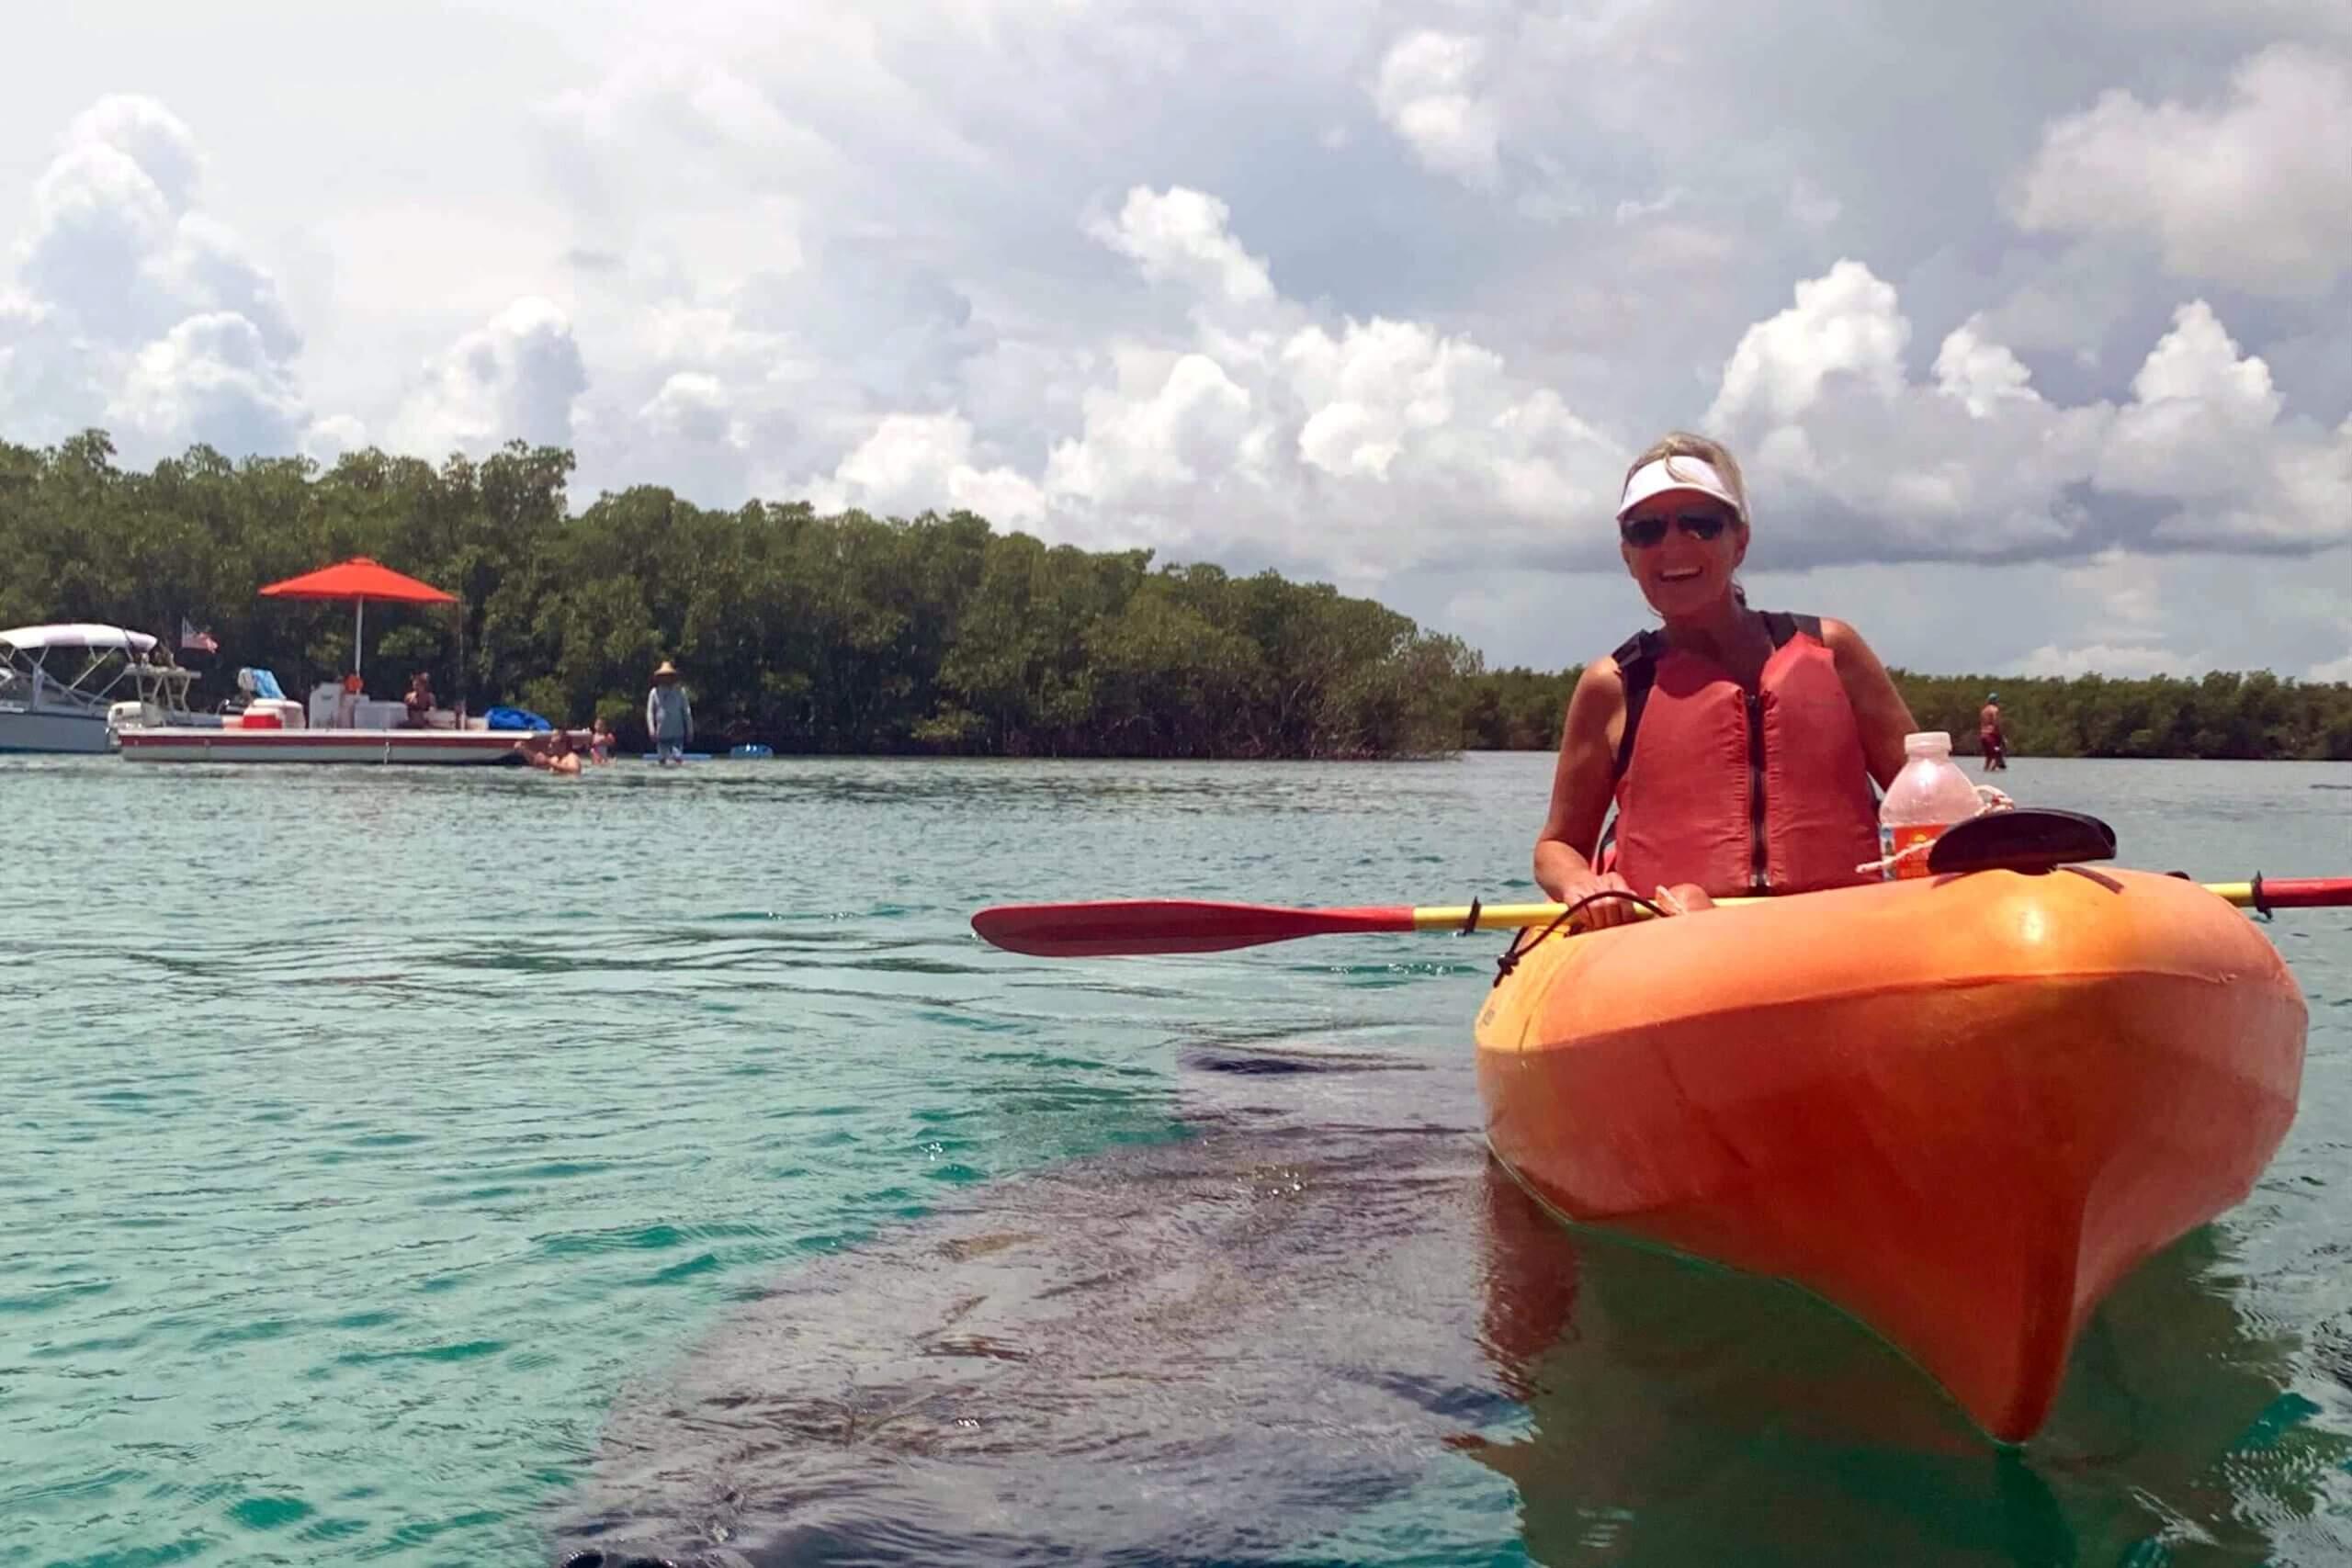 Babette enjoying a kayaking adventure while a manatee swims up close...